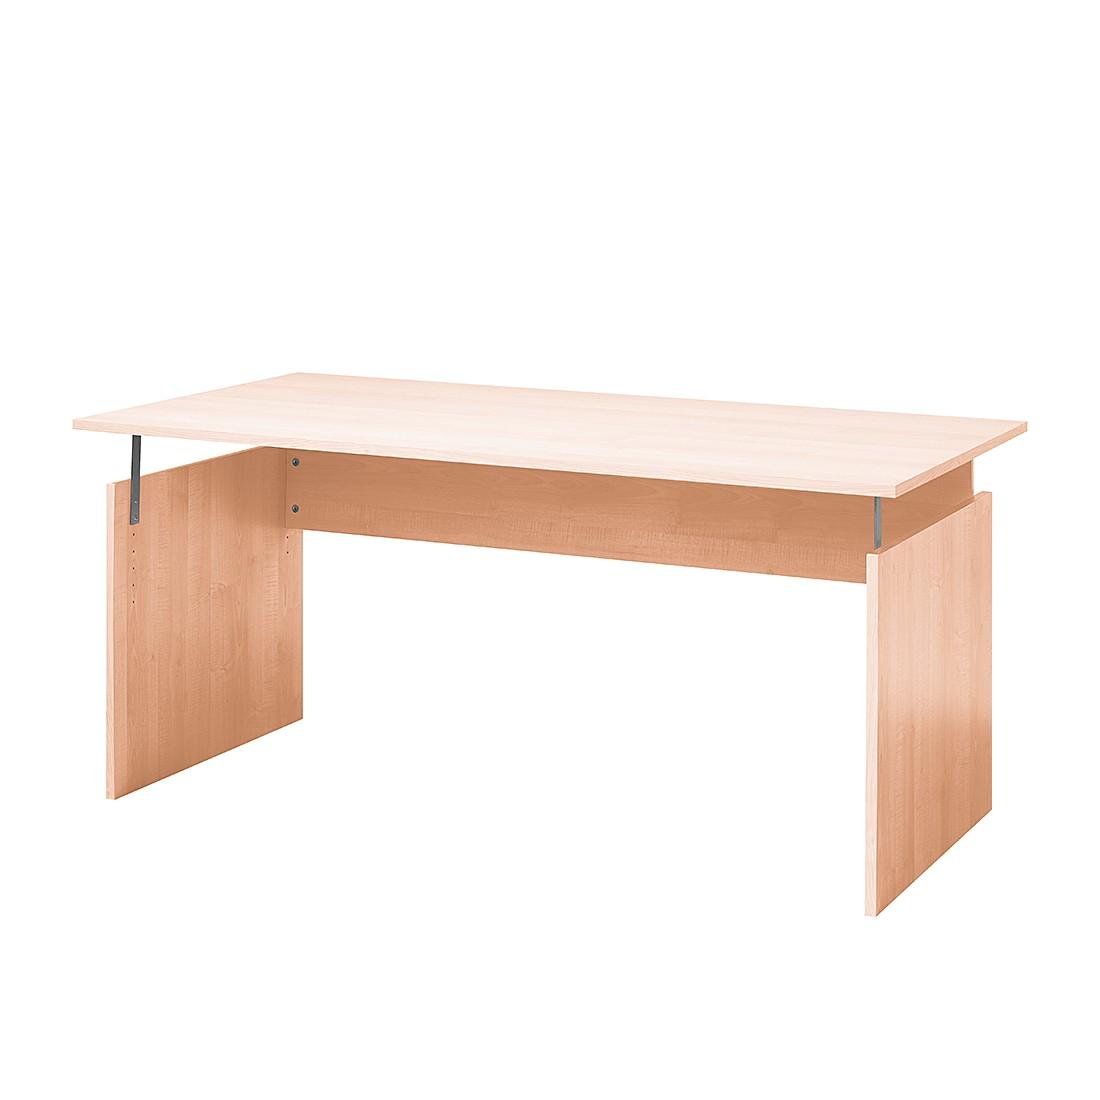 Home 24 - Bureau tomas viii - imitation hêtre - 160 cm, wellemöbel